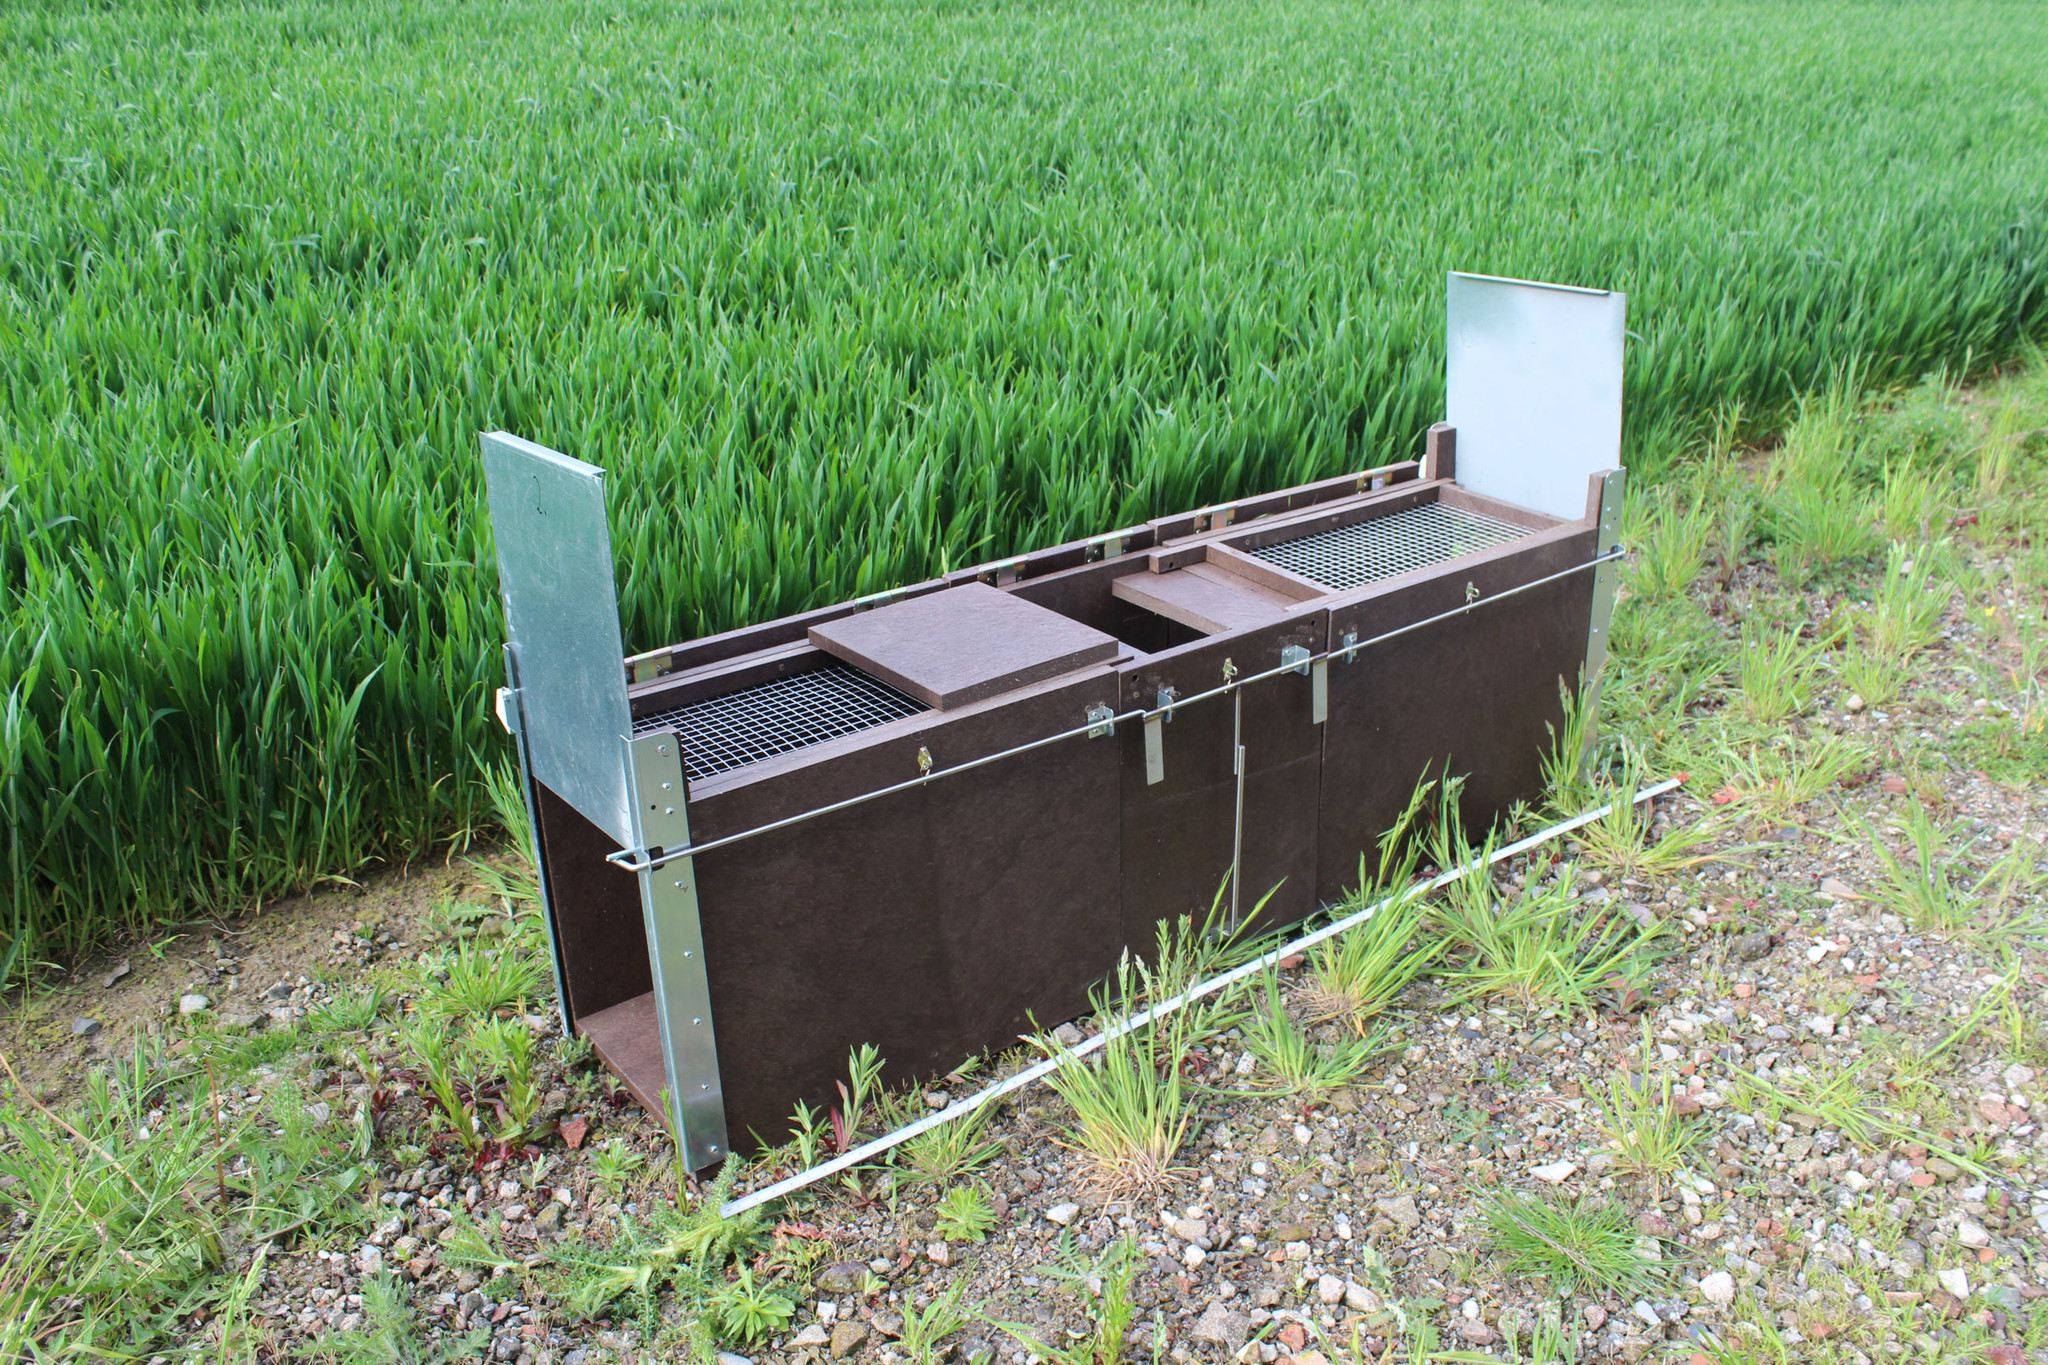 "Kastenfalle nach Hembes Modell ""Trapper-Box EASY"" aus Recyclingkunststoffplatten"